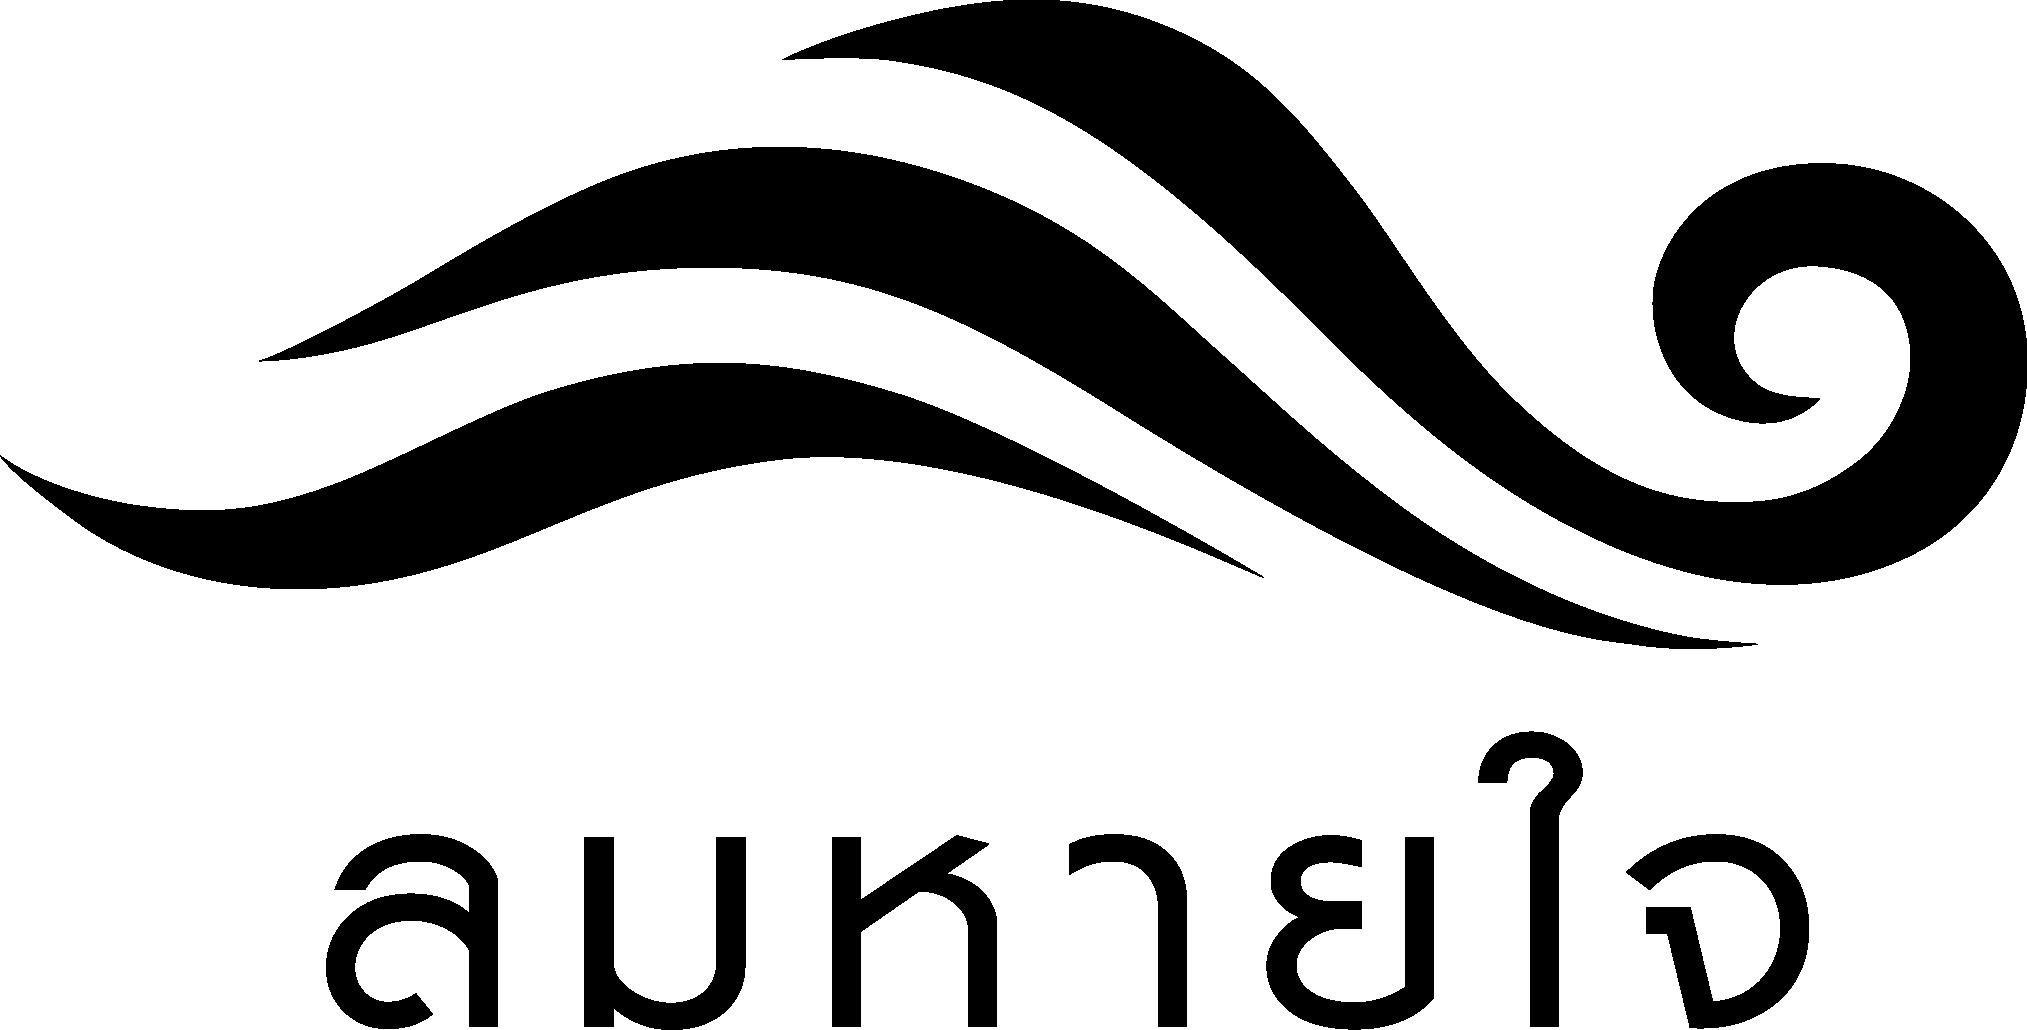 Lomhaijai